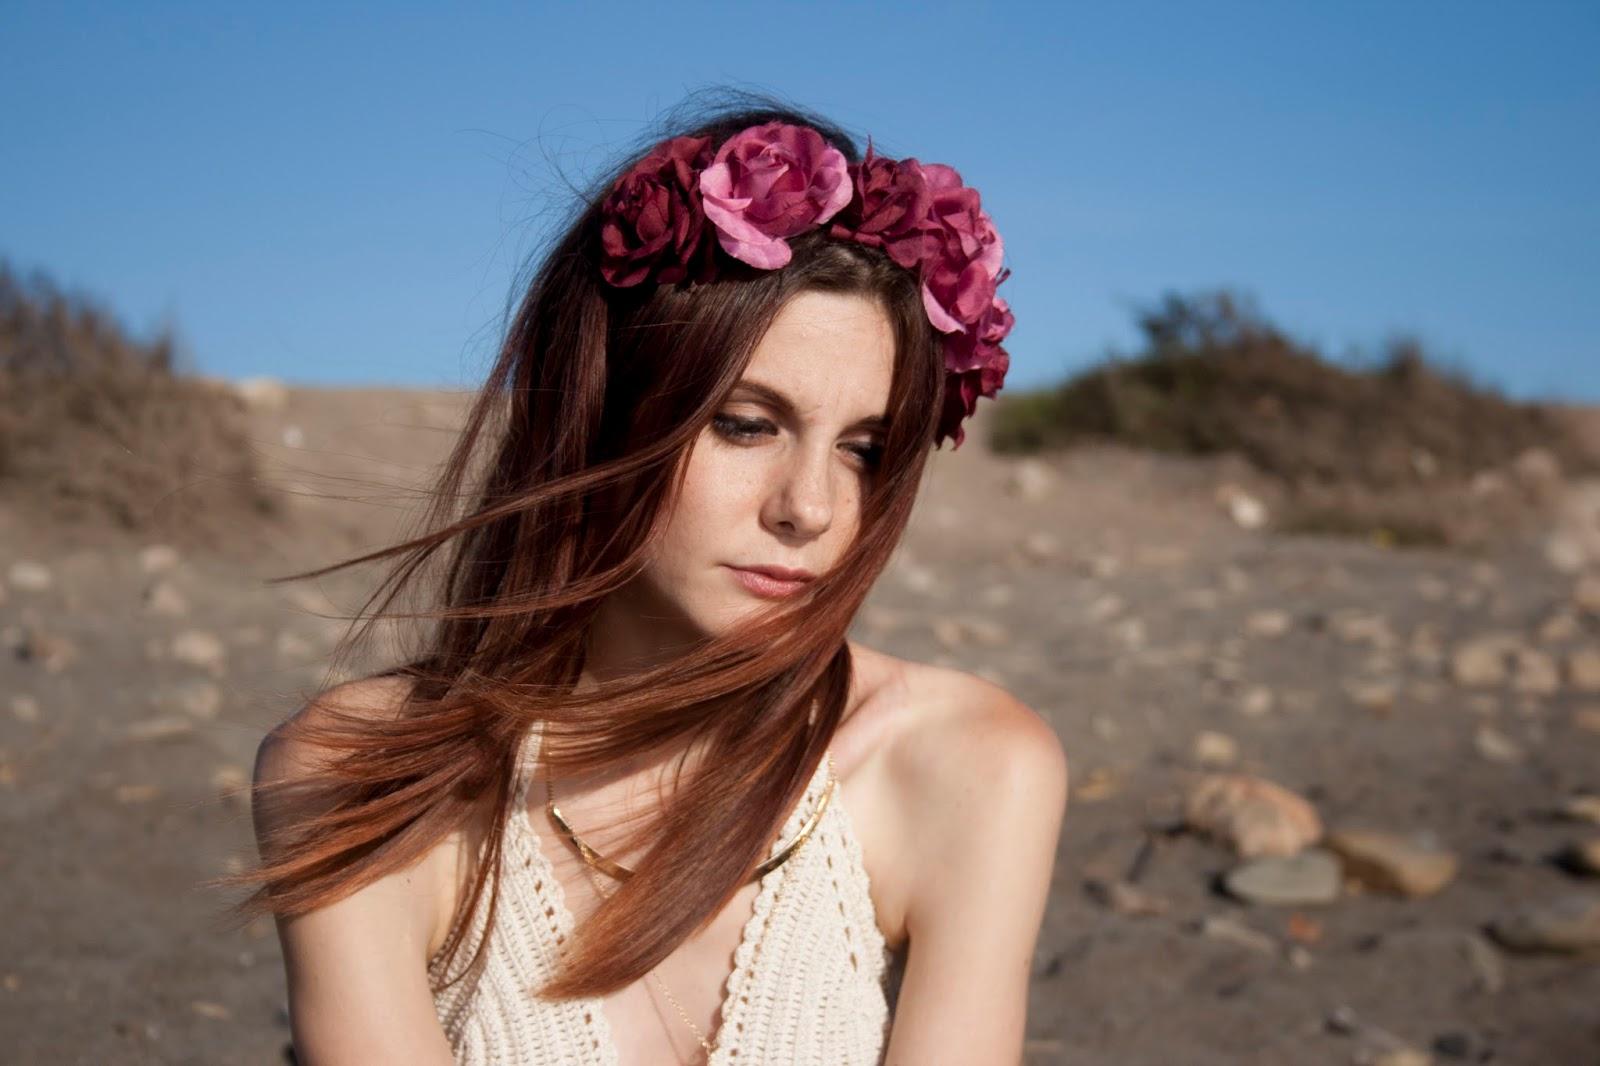 Boho-style-verano-outfit-corona-flores